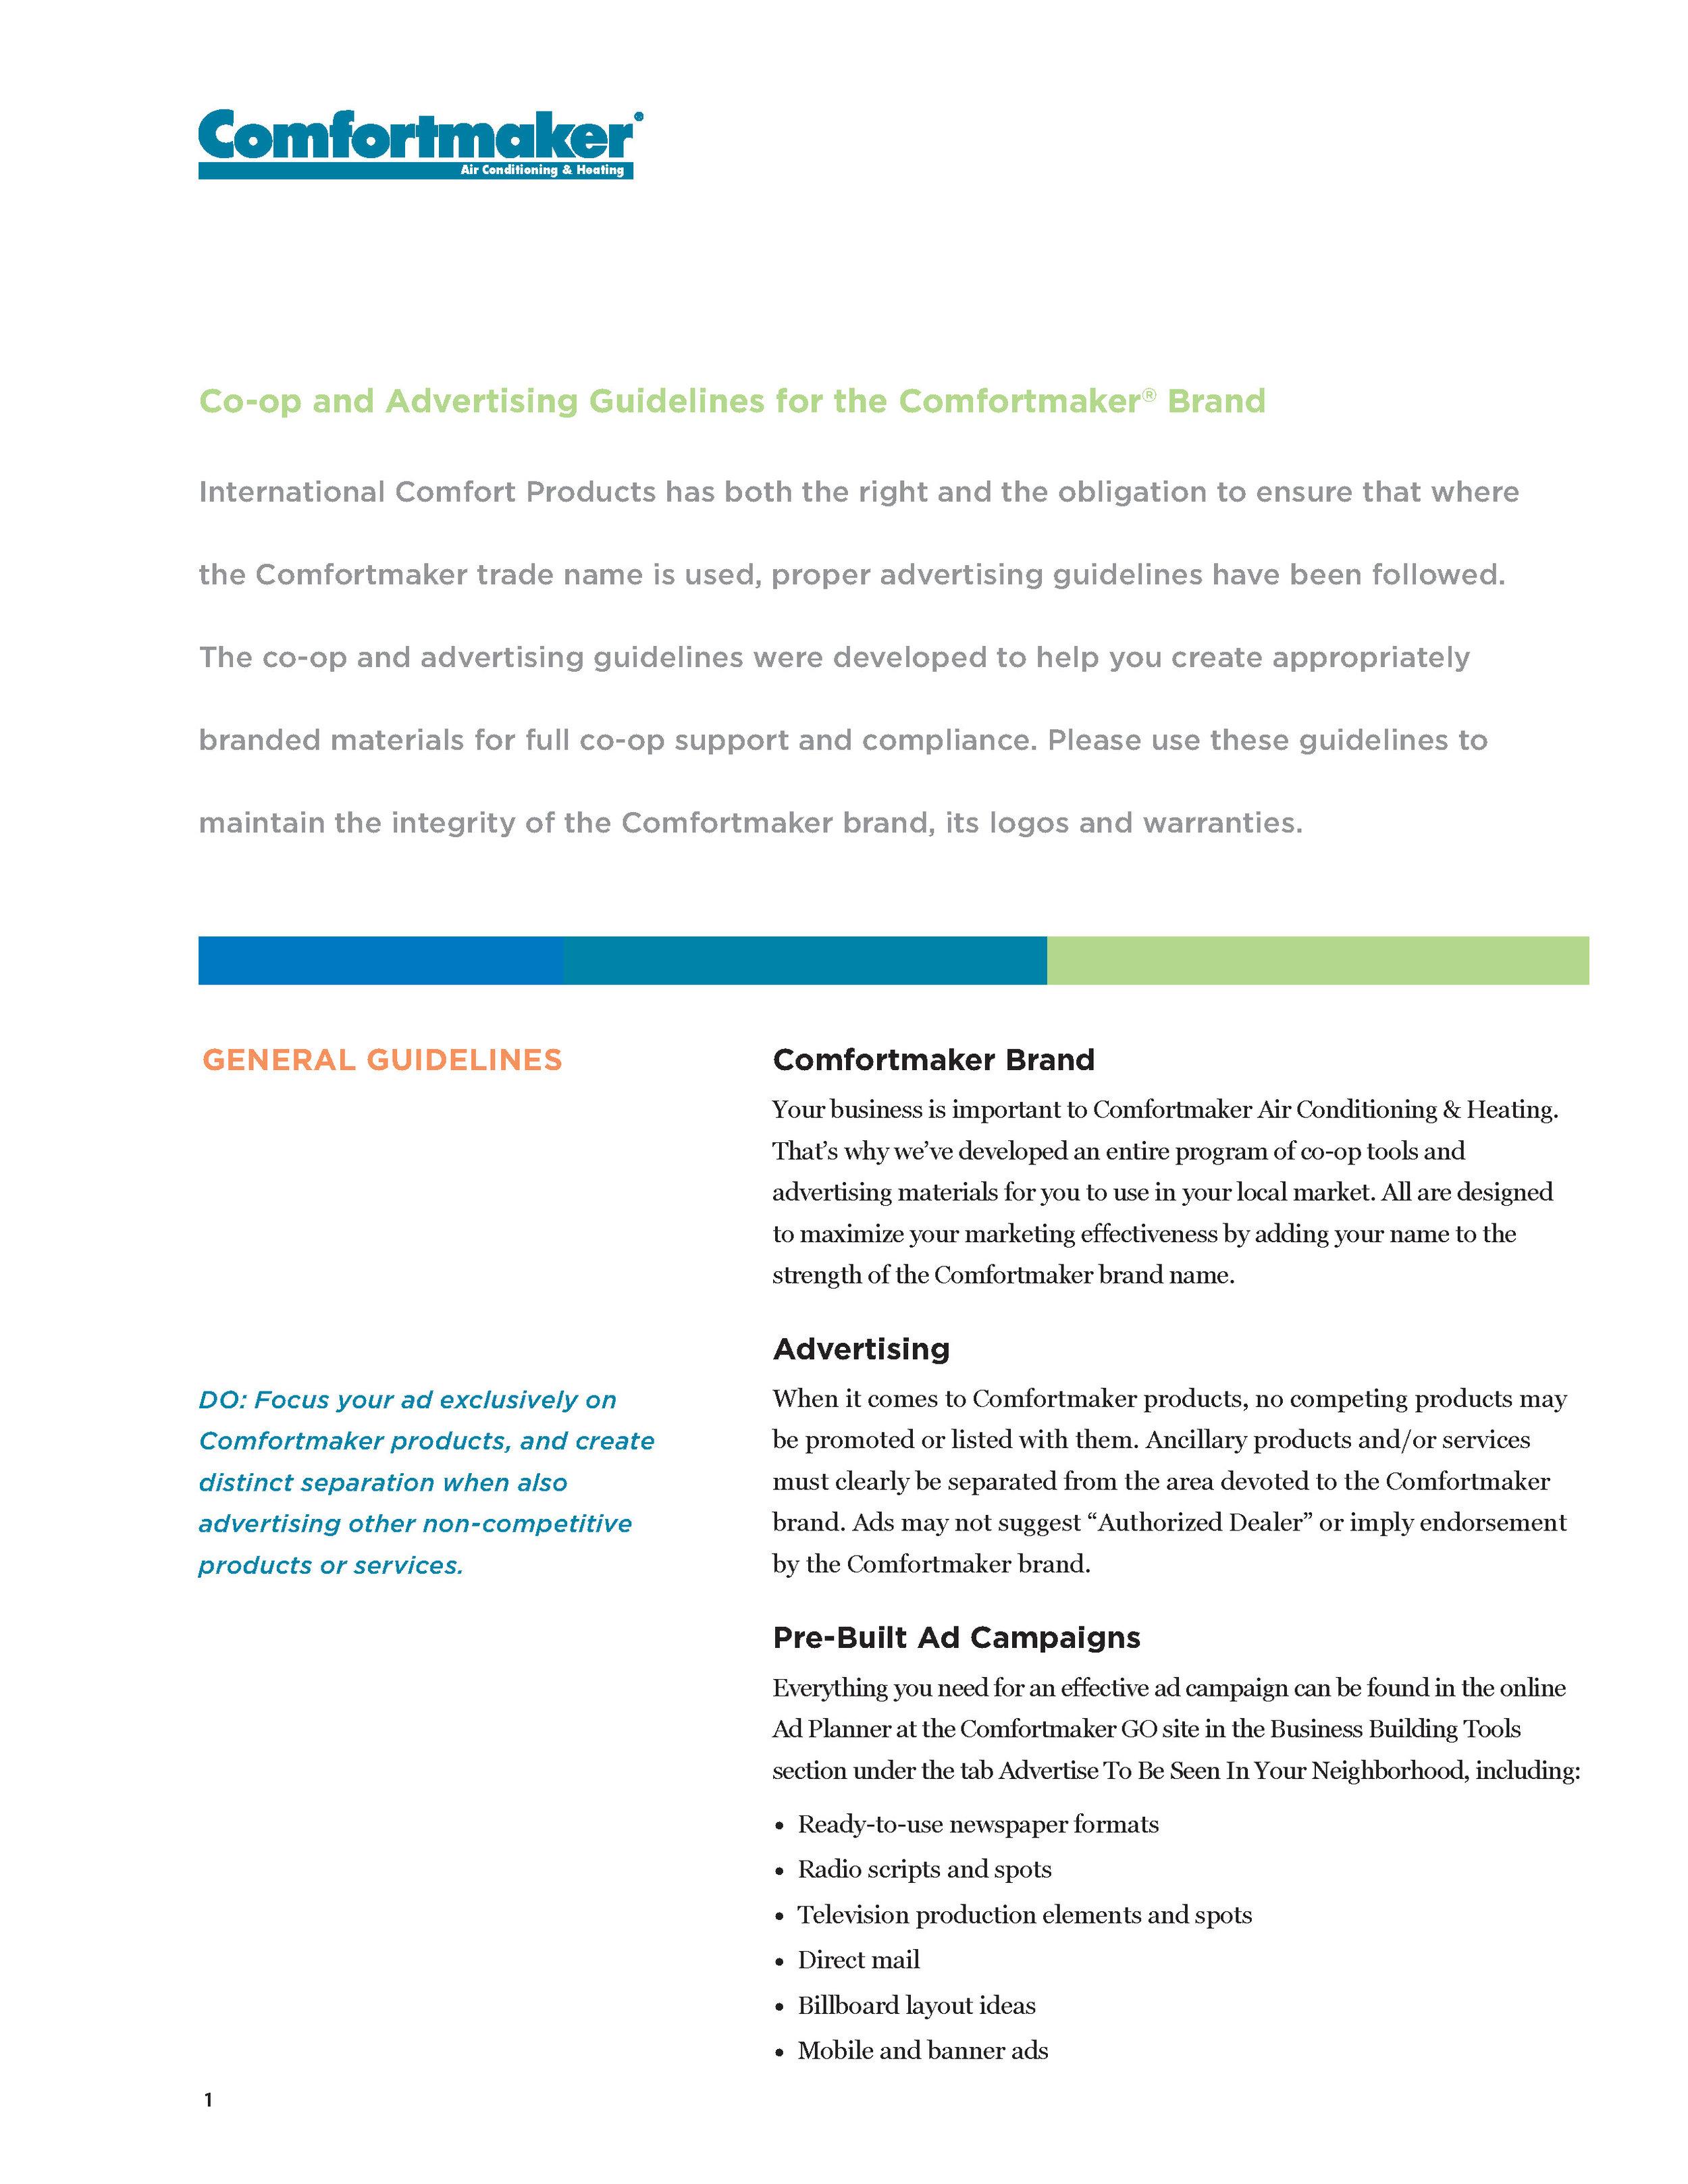 Comfortmaker Co-op and Advertising Guidelines